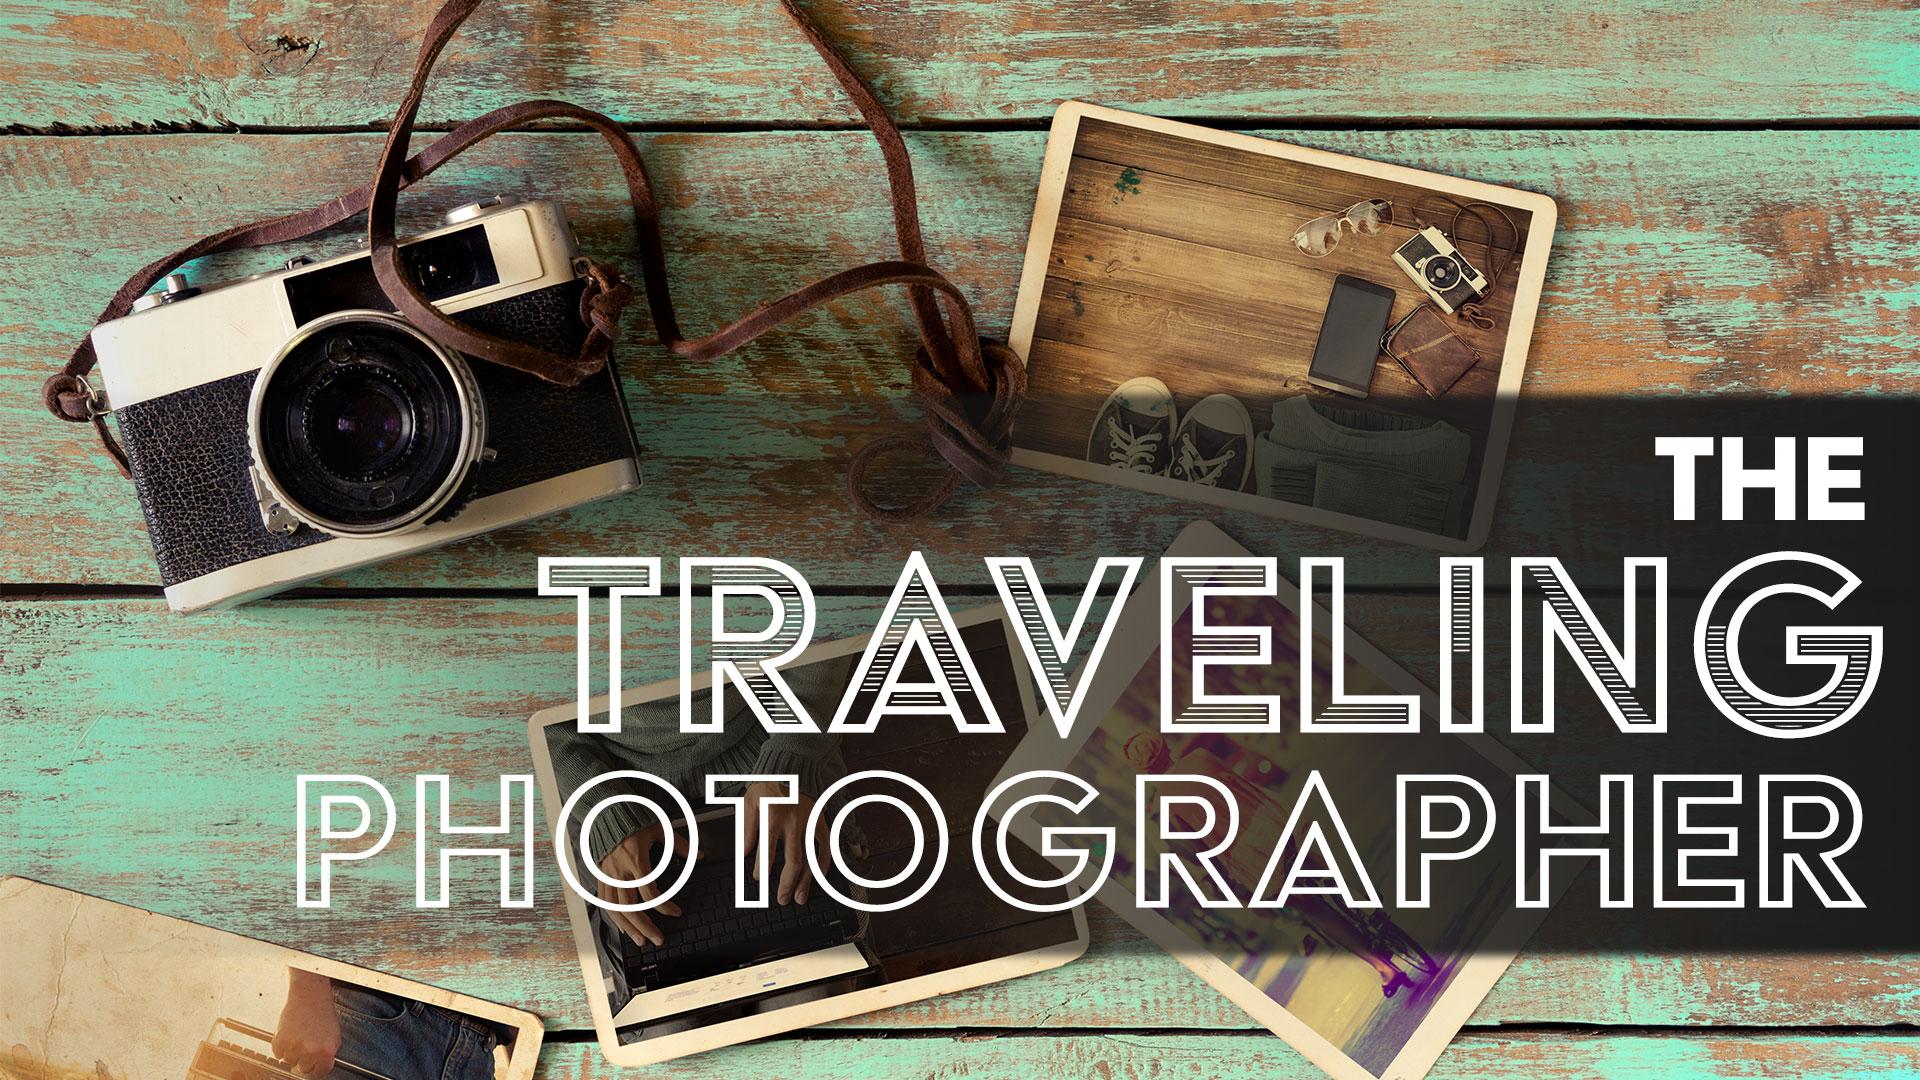 The Traveling Photographer Column on Photofocus.com